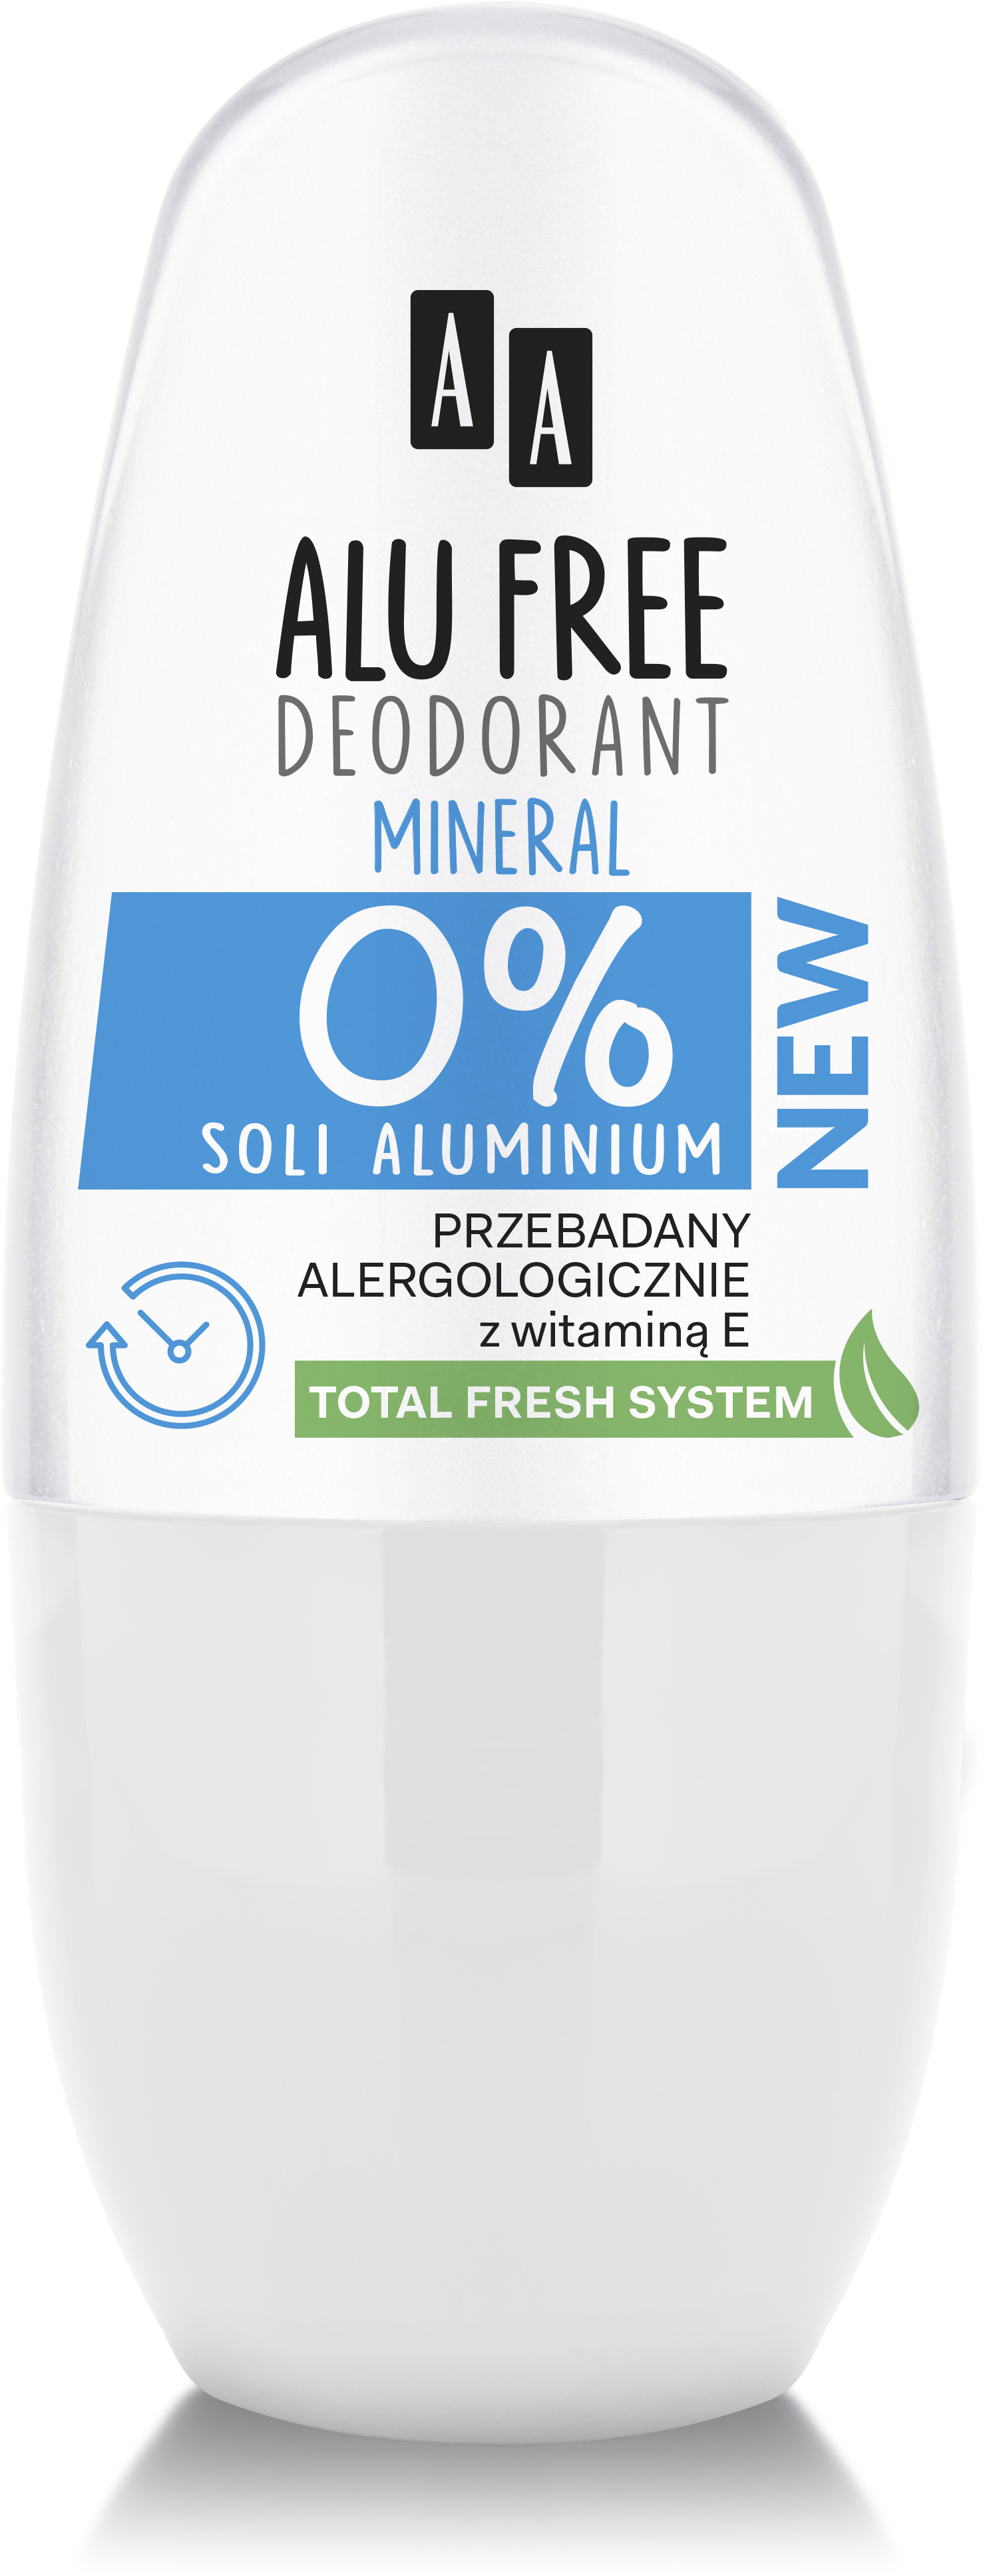 Oceanic dezodorant w kulce Alu Free Mineral 50ml Cosmetics